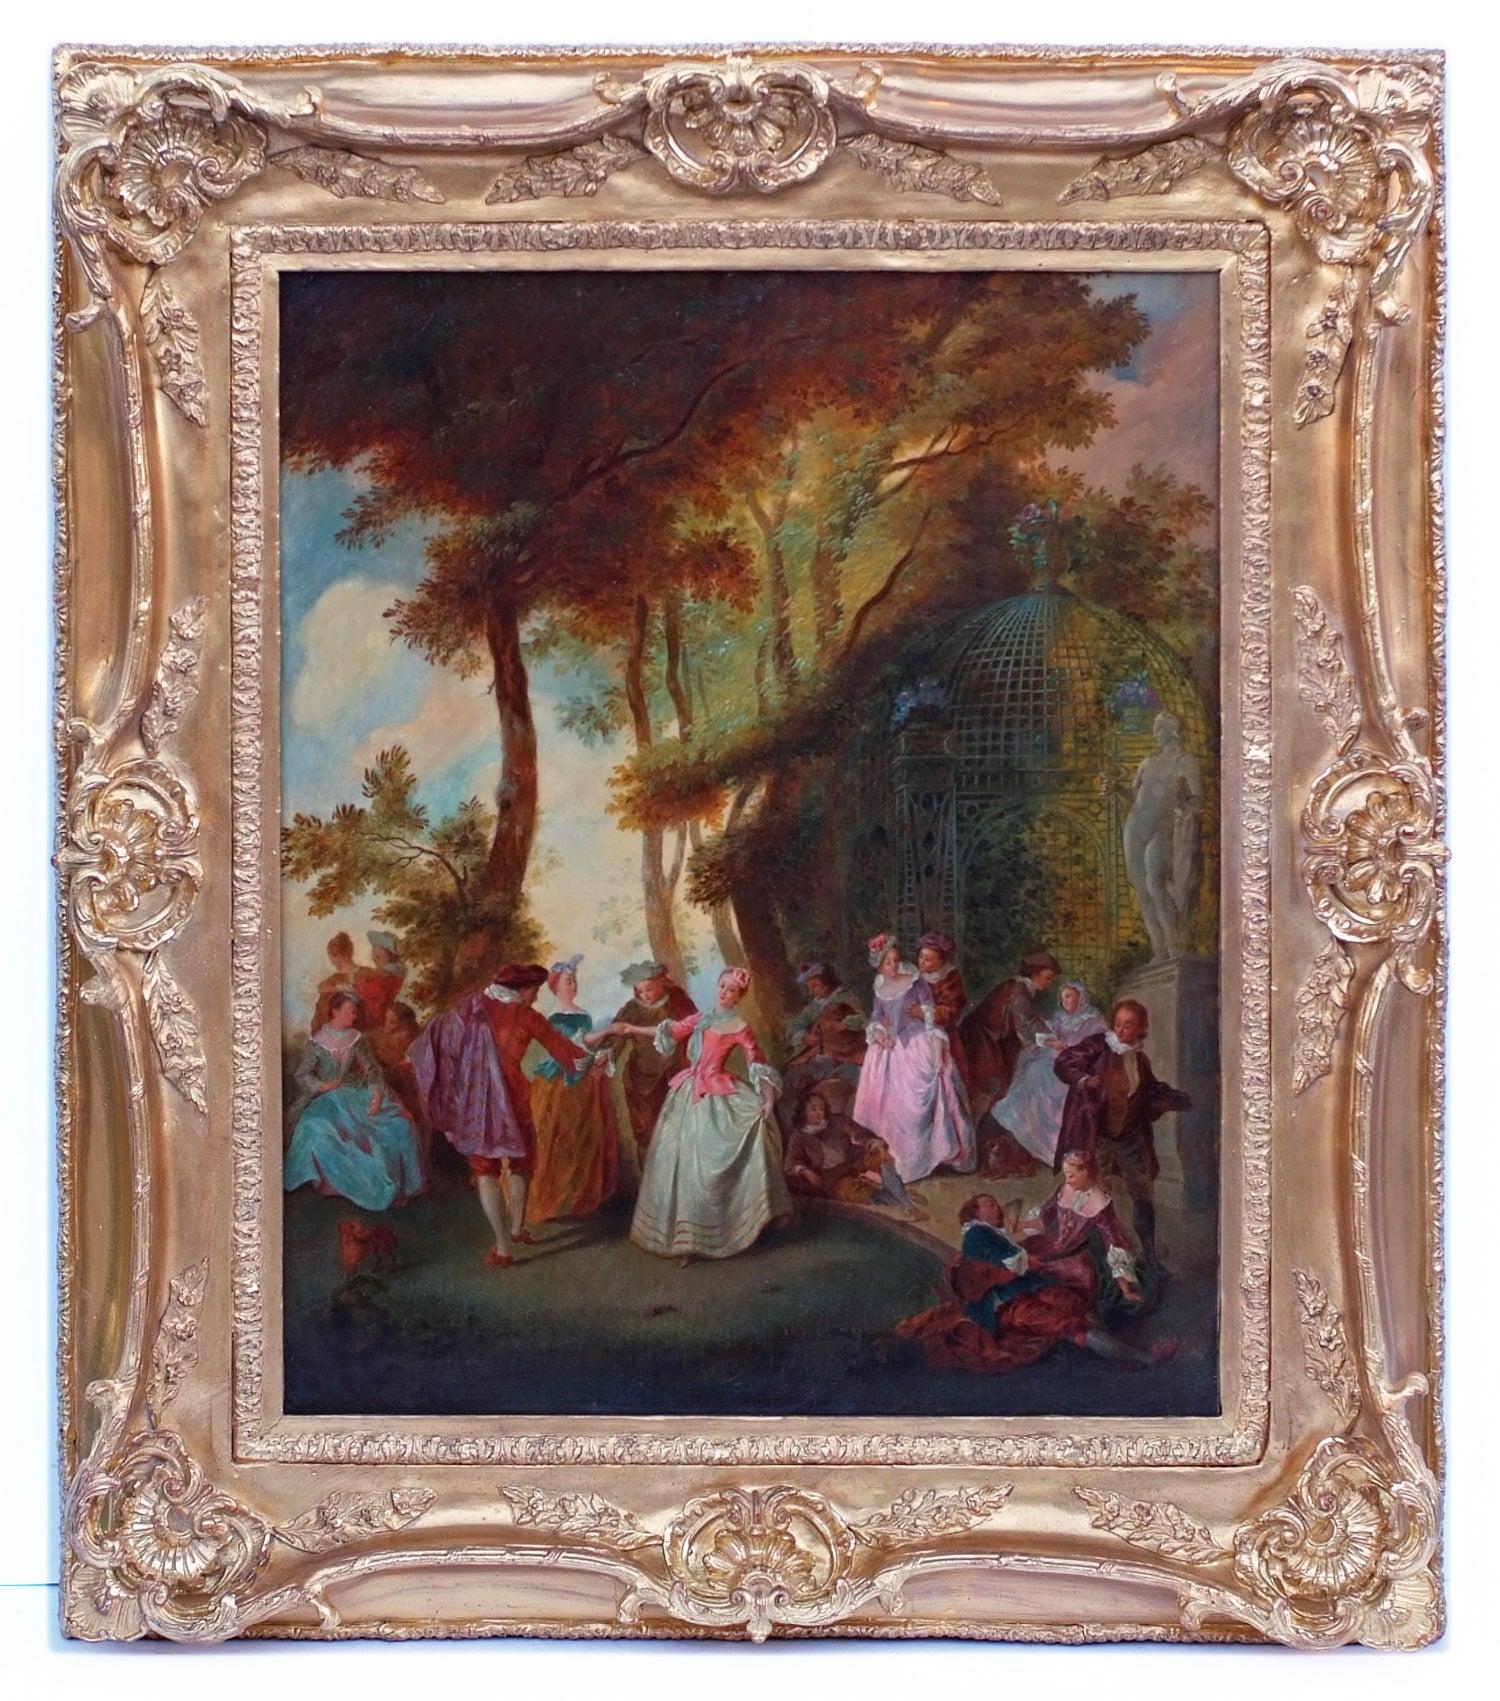 Painting 19th Century Romantic Courtiers Genre Scene